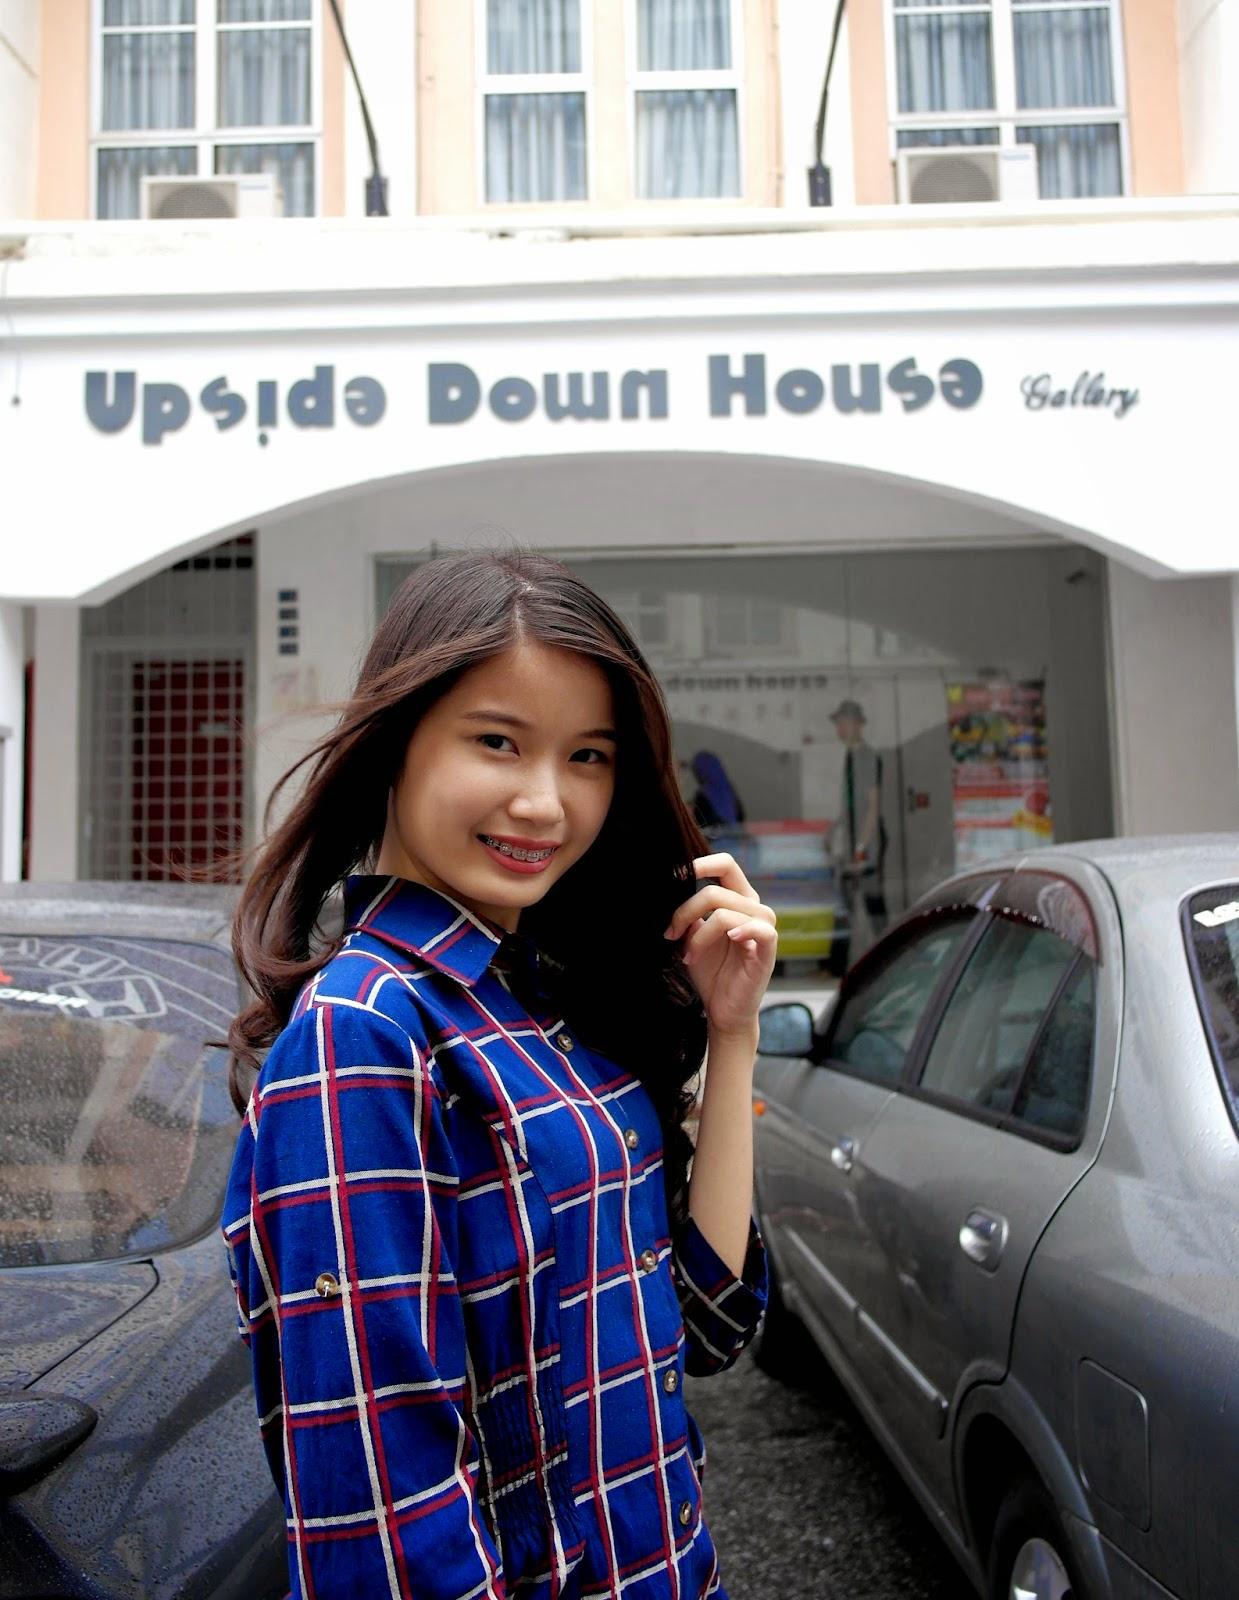 M A N D Y: Upside Down House Gallery @ Melaka